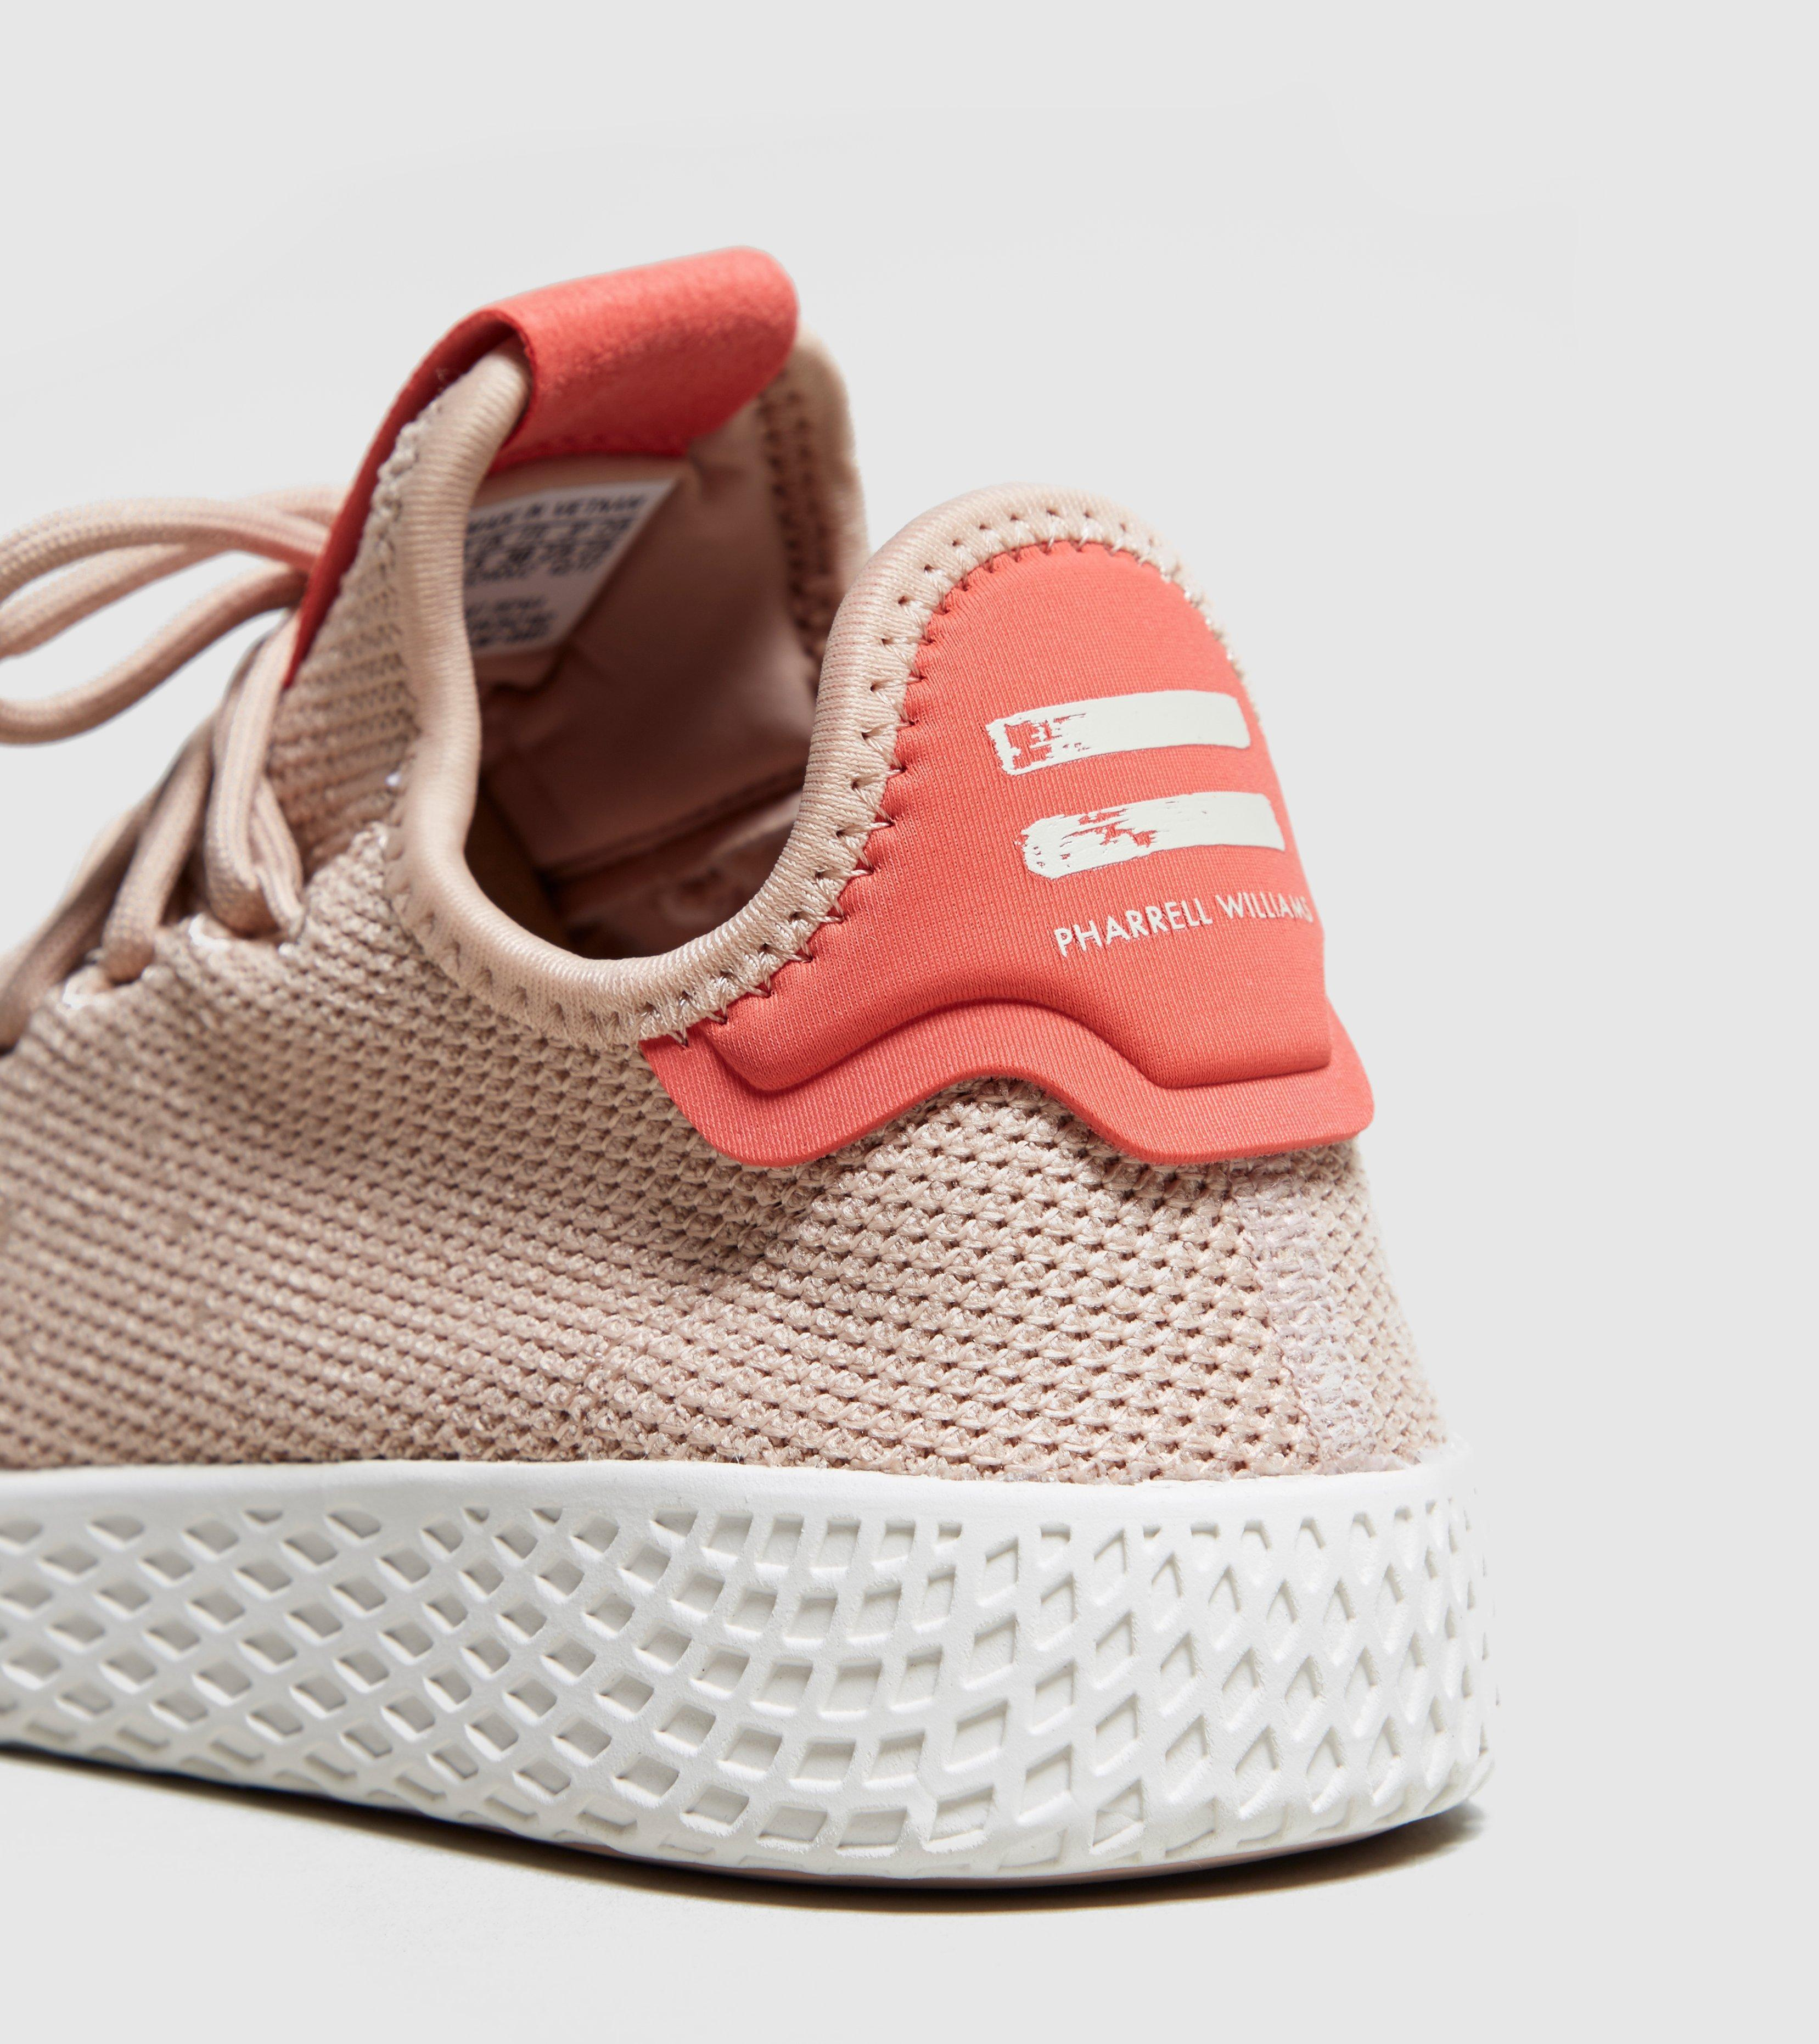 Lyst - adidas Originals X Pharrell Williams Tennis Hu Women s in Pink 3ea9d05e8